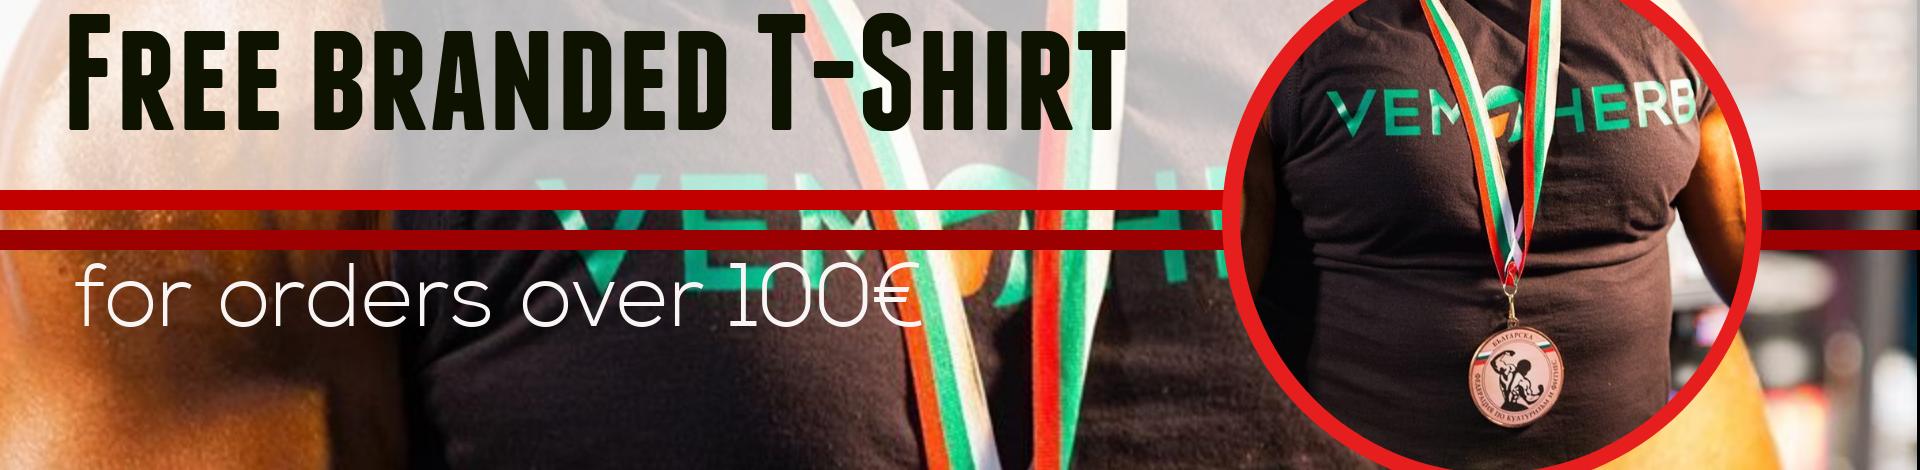 vemoherb branded t-shirt